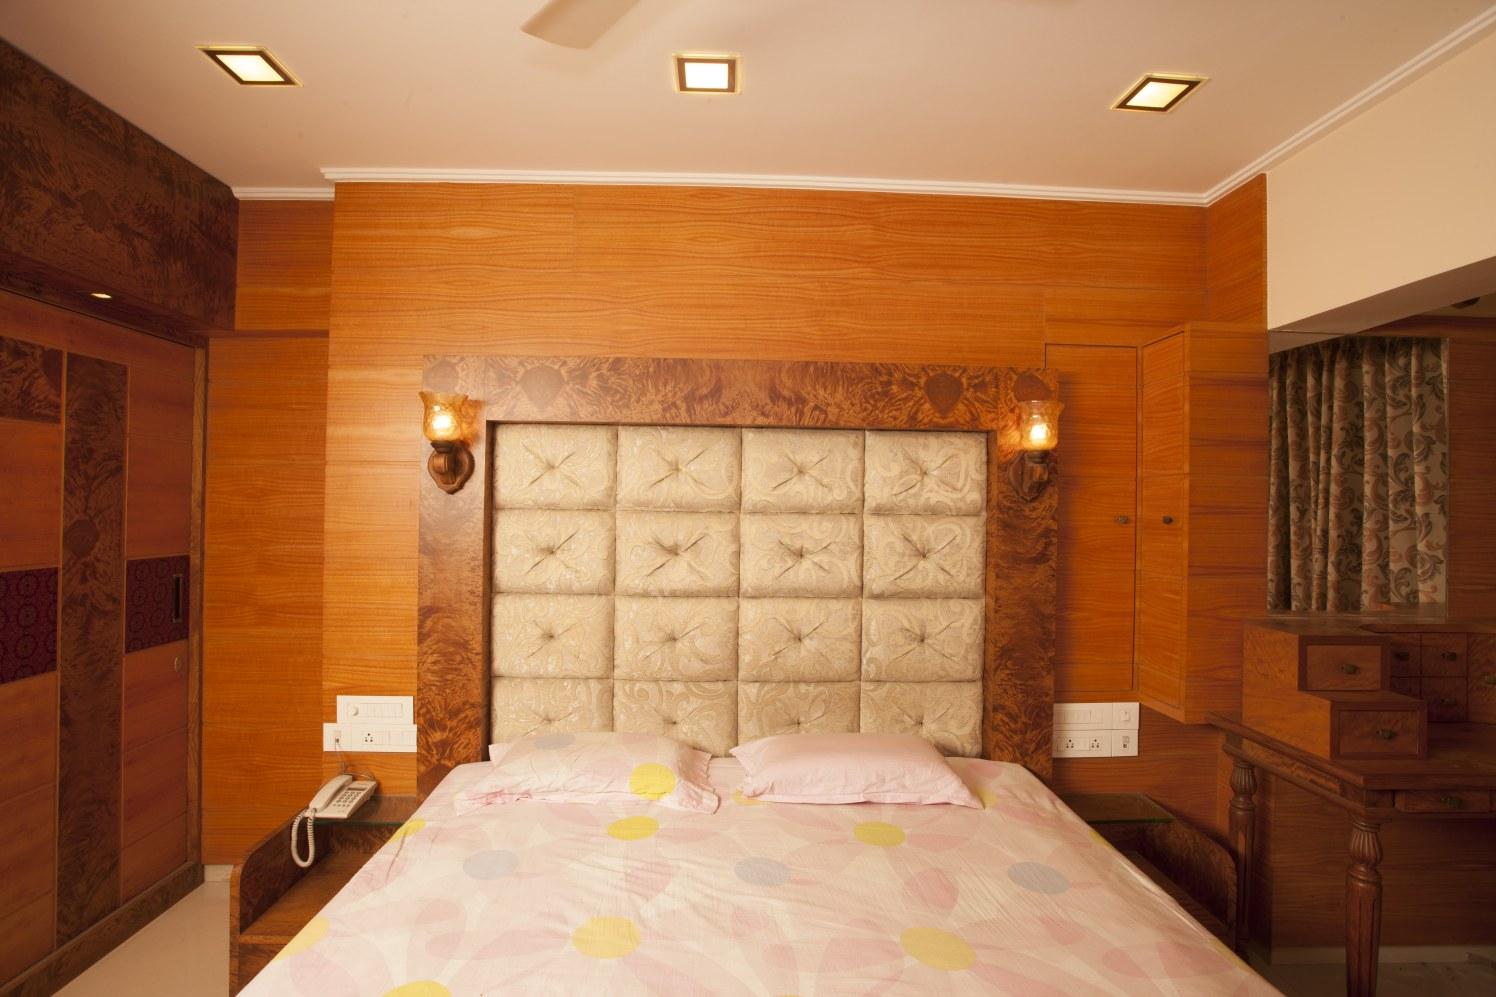 Classy Sleepover by Plus One Interiors Bedroom Contemporary | Interior Design Photos & Ideas